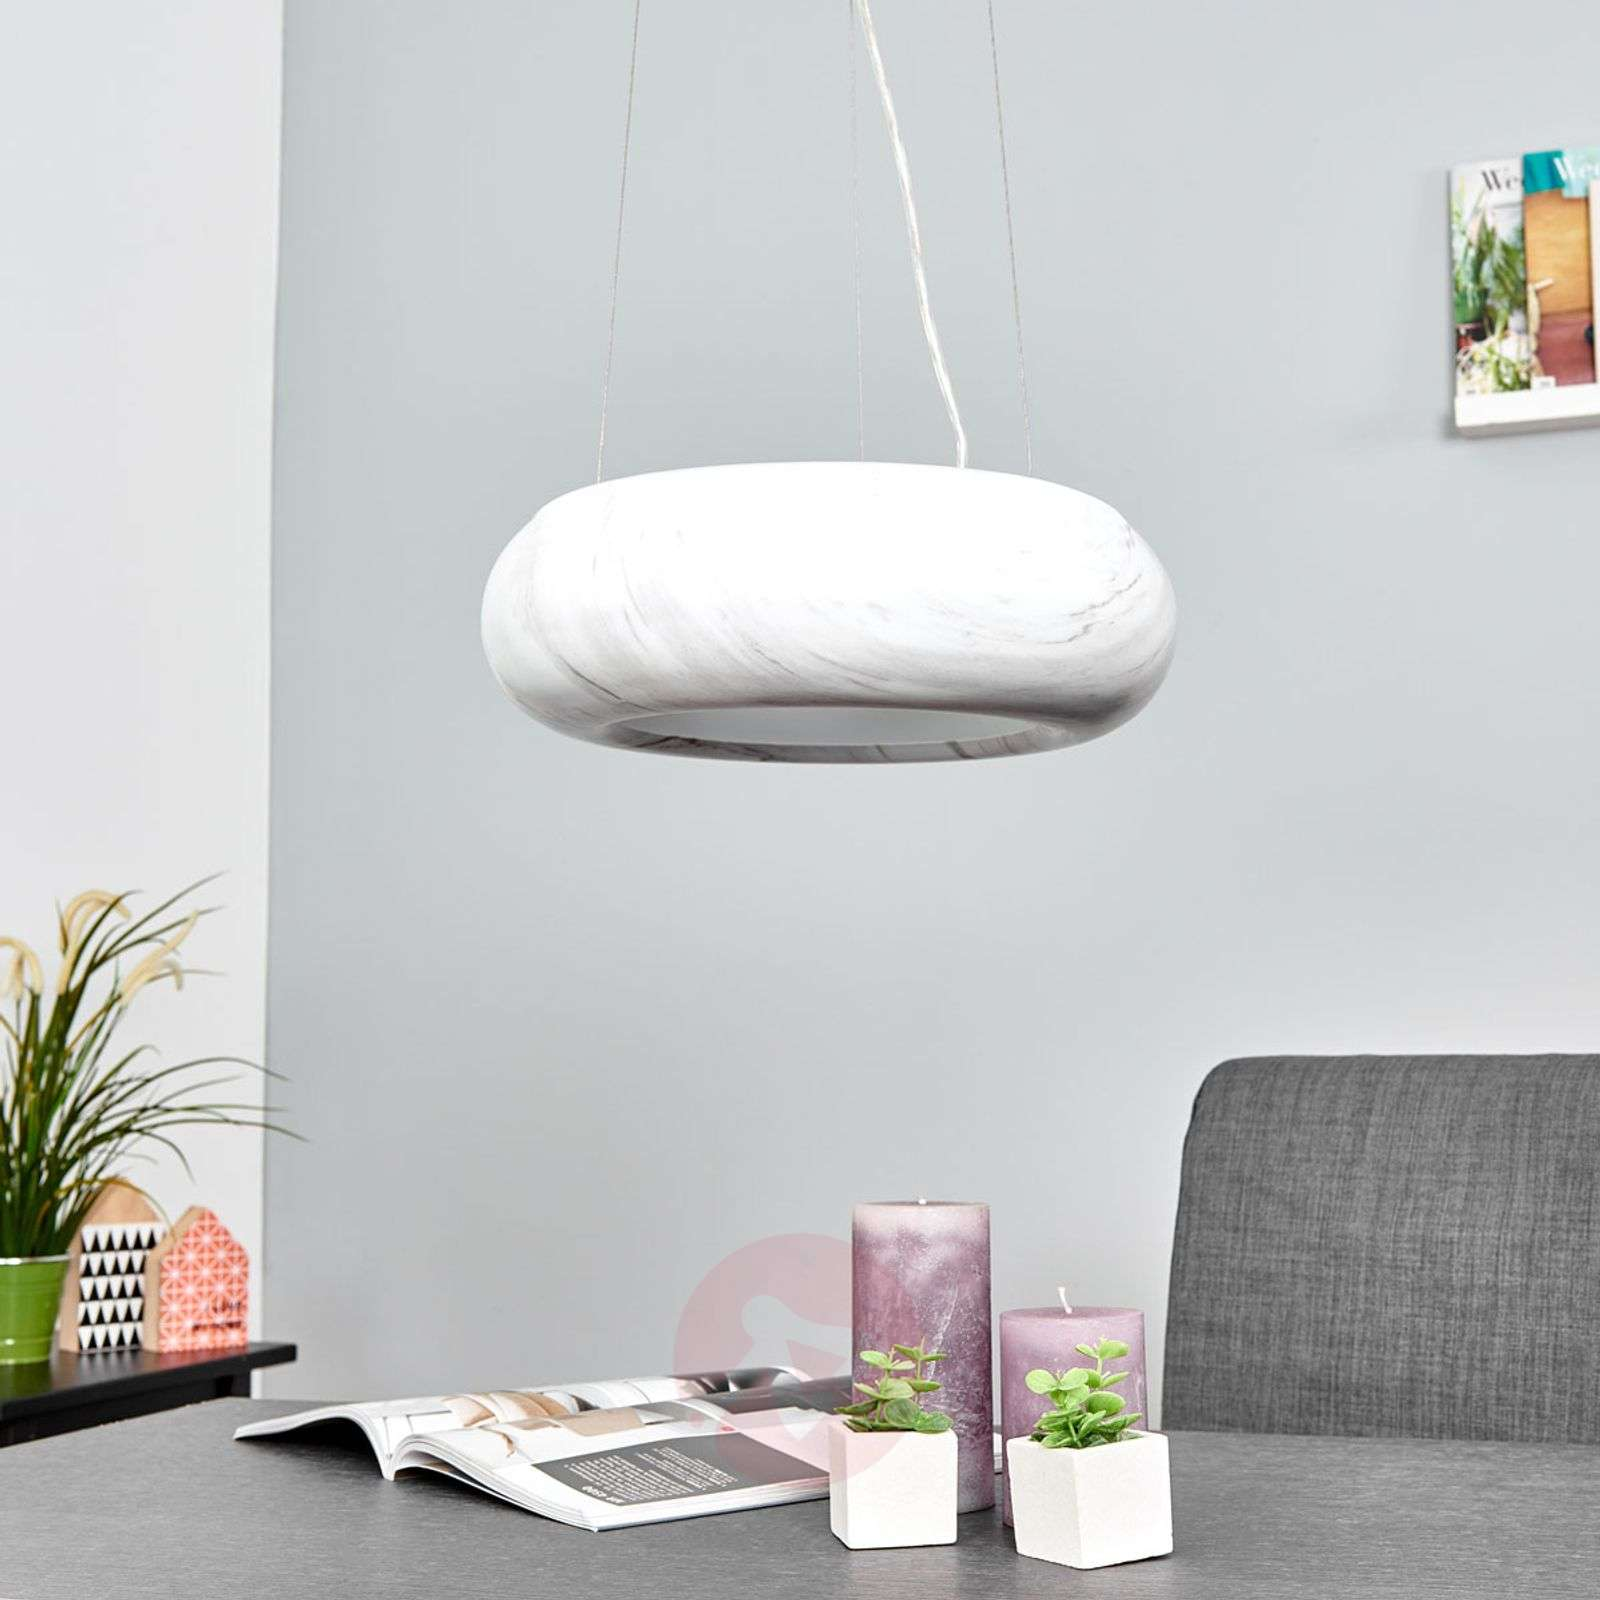 Marbled LED pendant lamp Saina-9639020-01